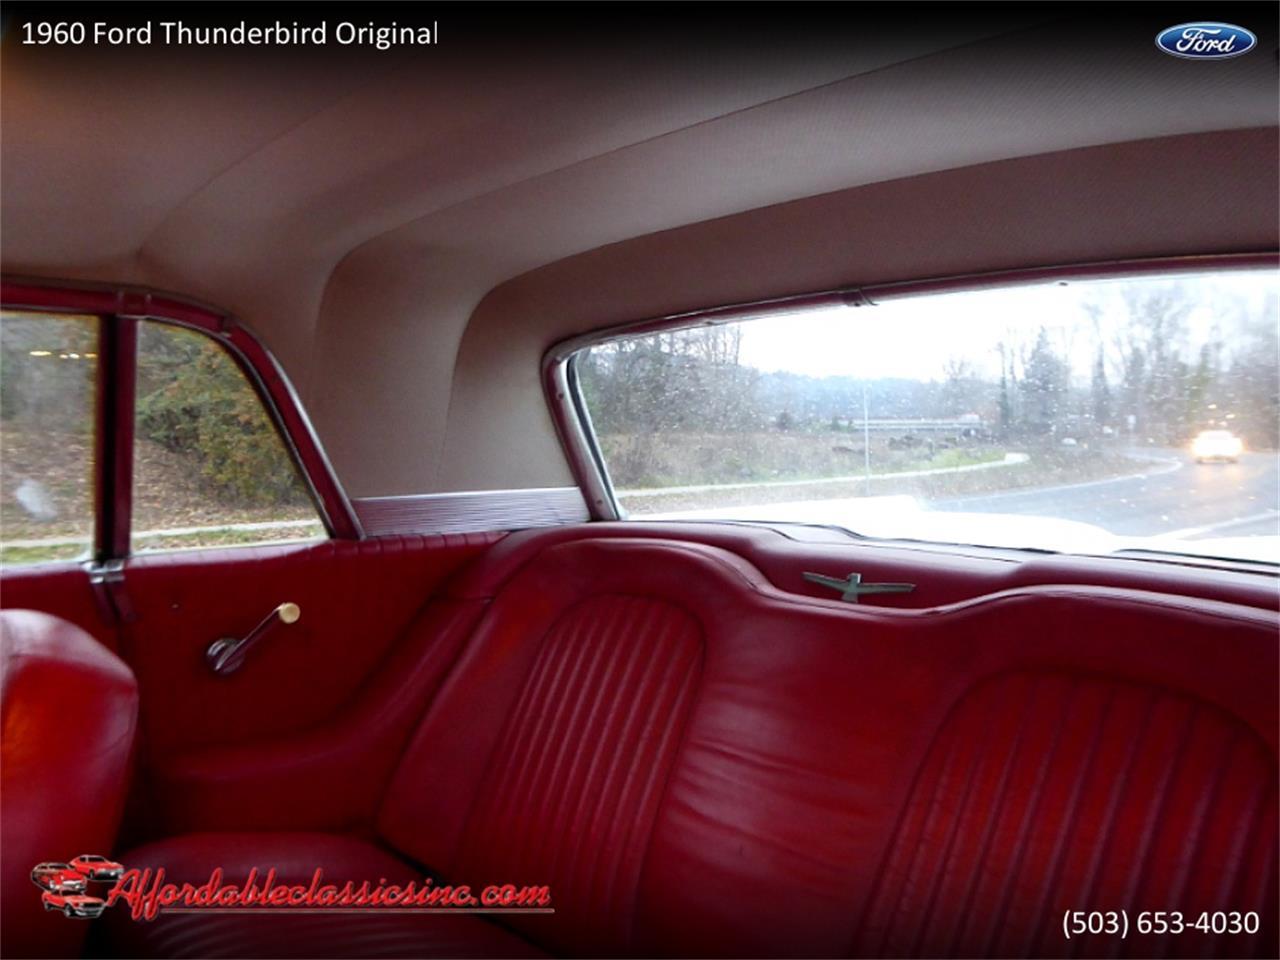 1960 Ford Thunderbird (CC-1330669) for sale in Gladstone, Oregon